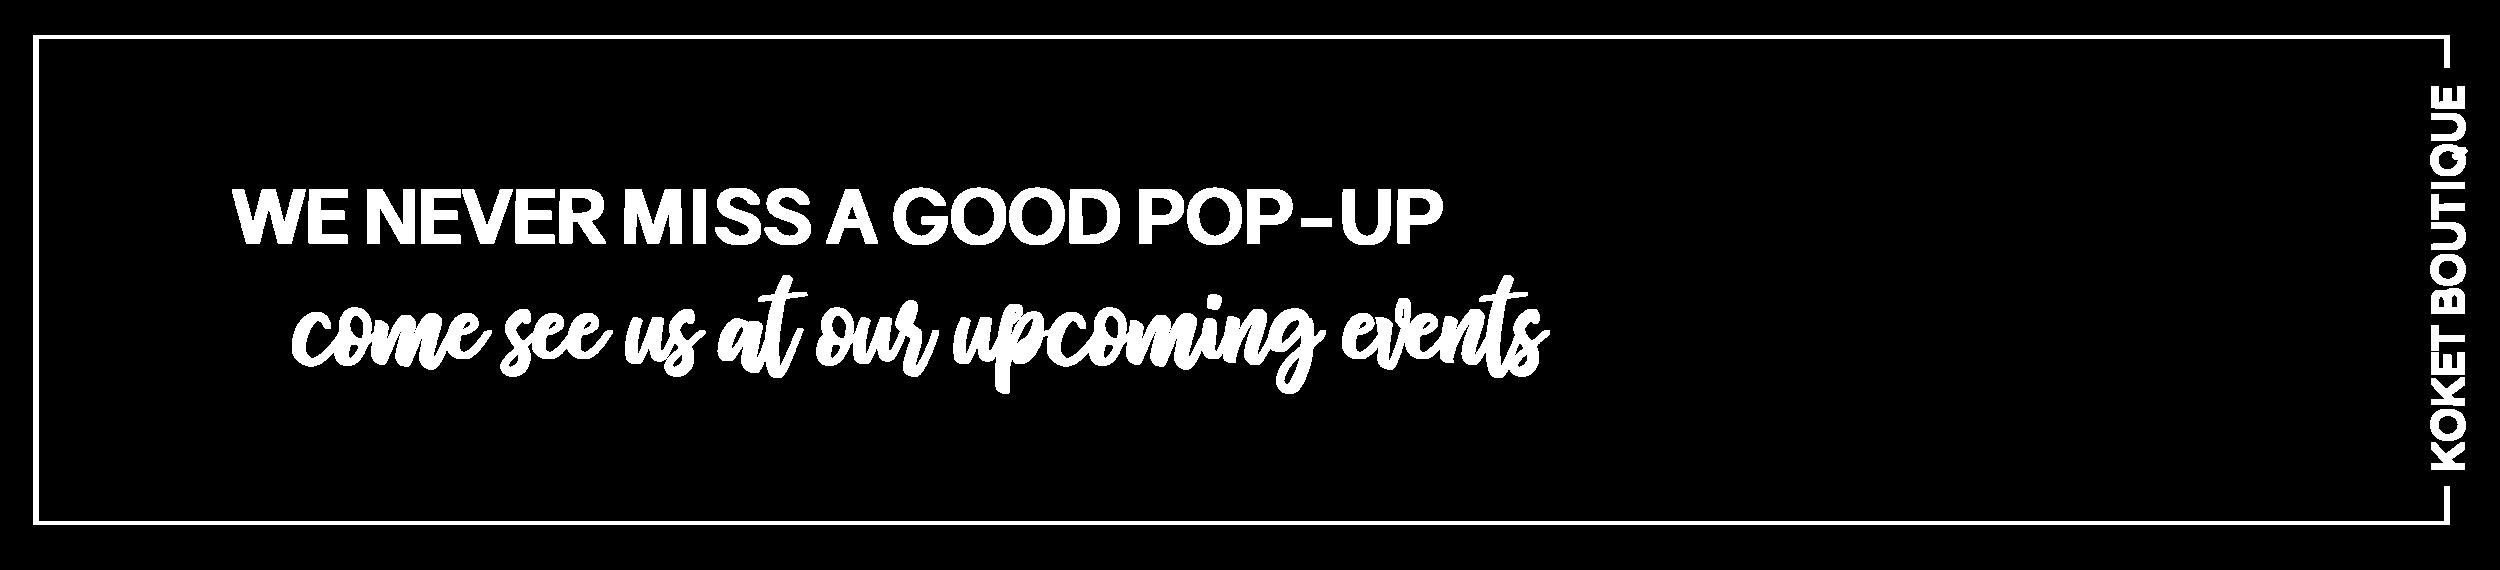 Pop-up-01.png